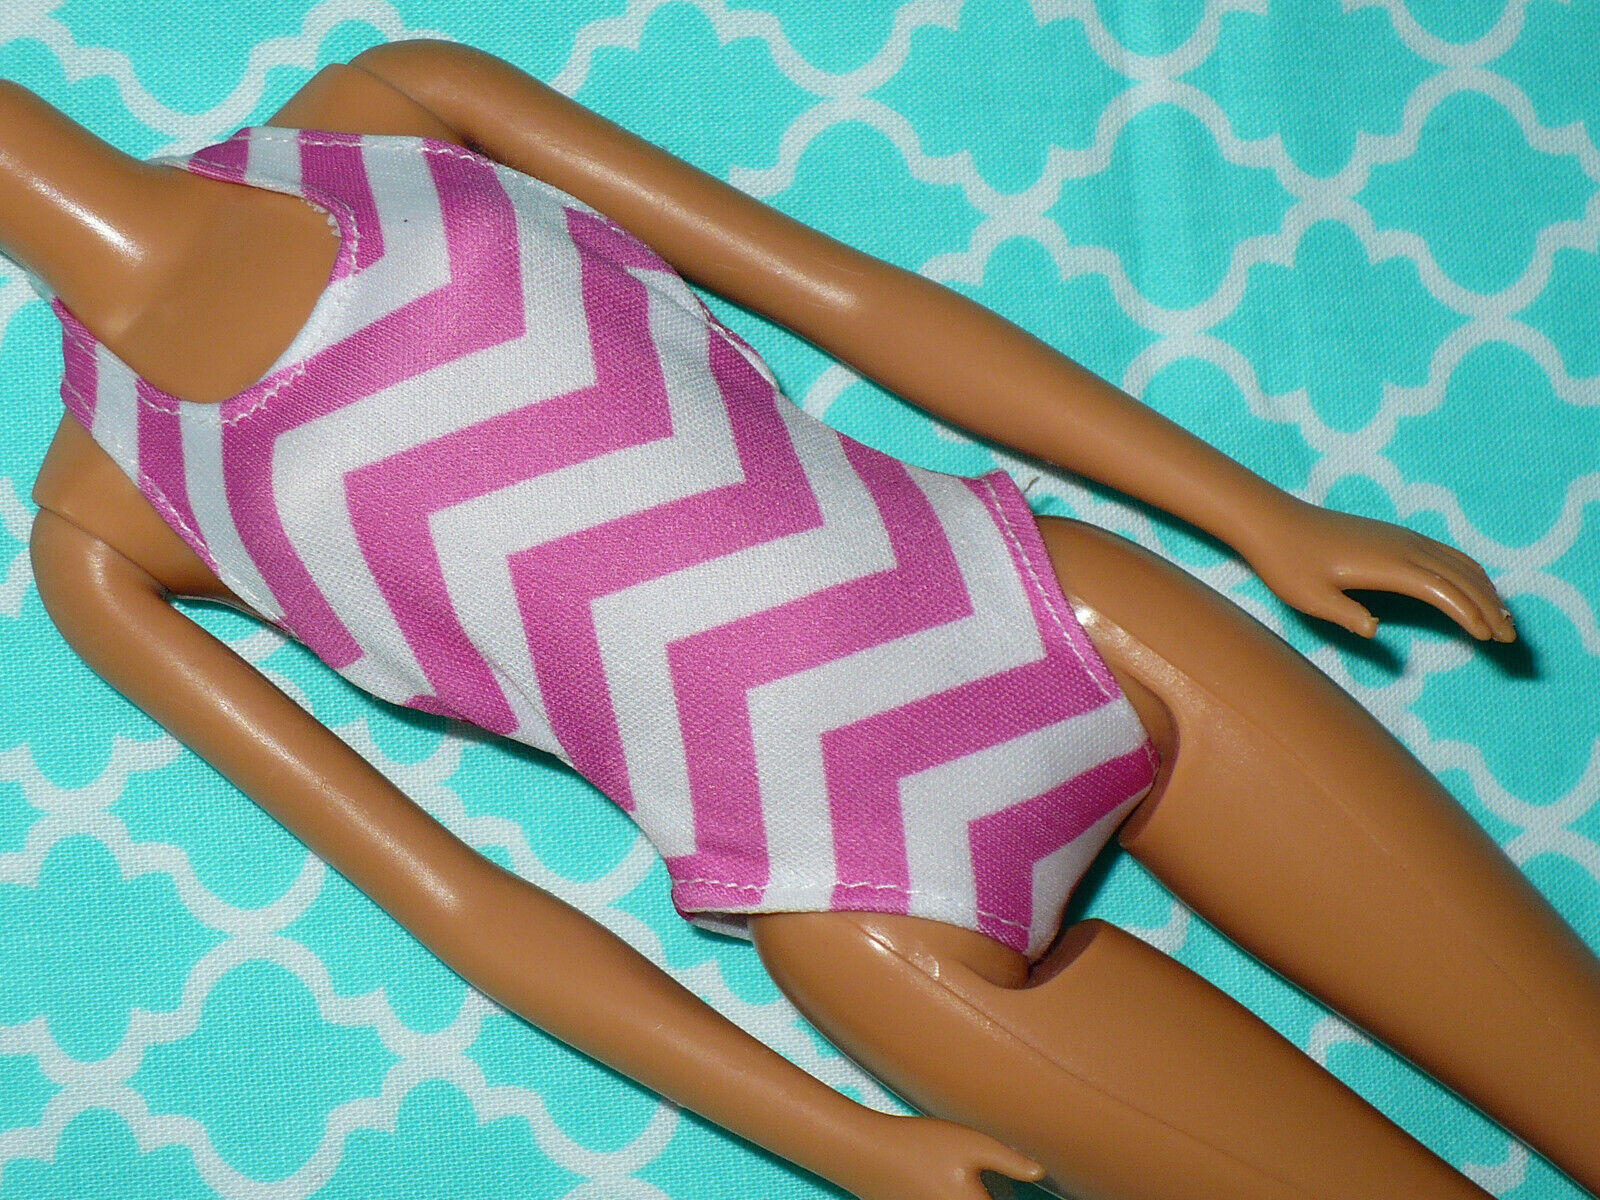 Mattel Barbie Doll Clothing WHITE PINK CHEVRON BATHING SUIT SWIMSUIT 1 Piece - $12.79